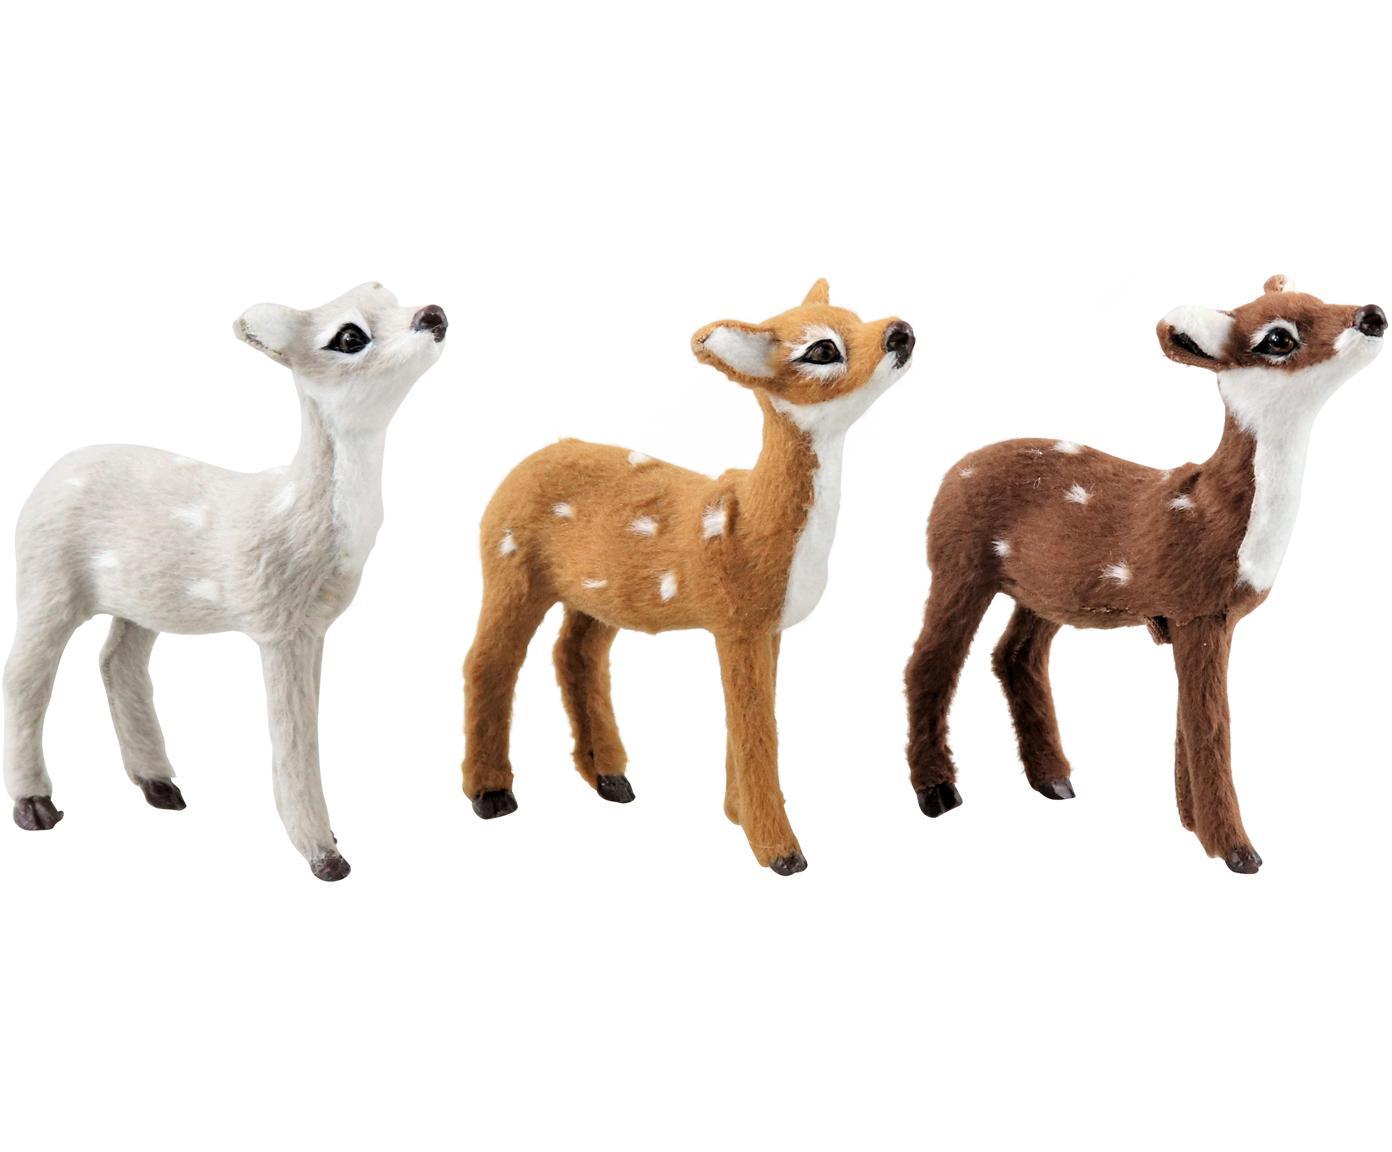 Deko-Objekte Bambi, 3-tlg., Polyresin, Weiss, Brauntöne, 8 x 10 cm